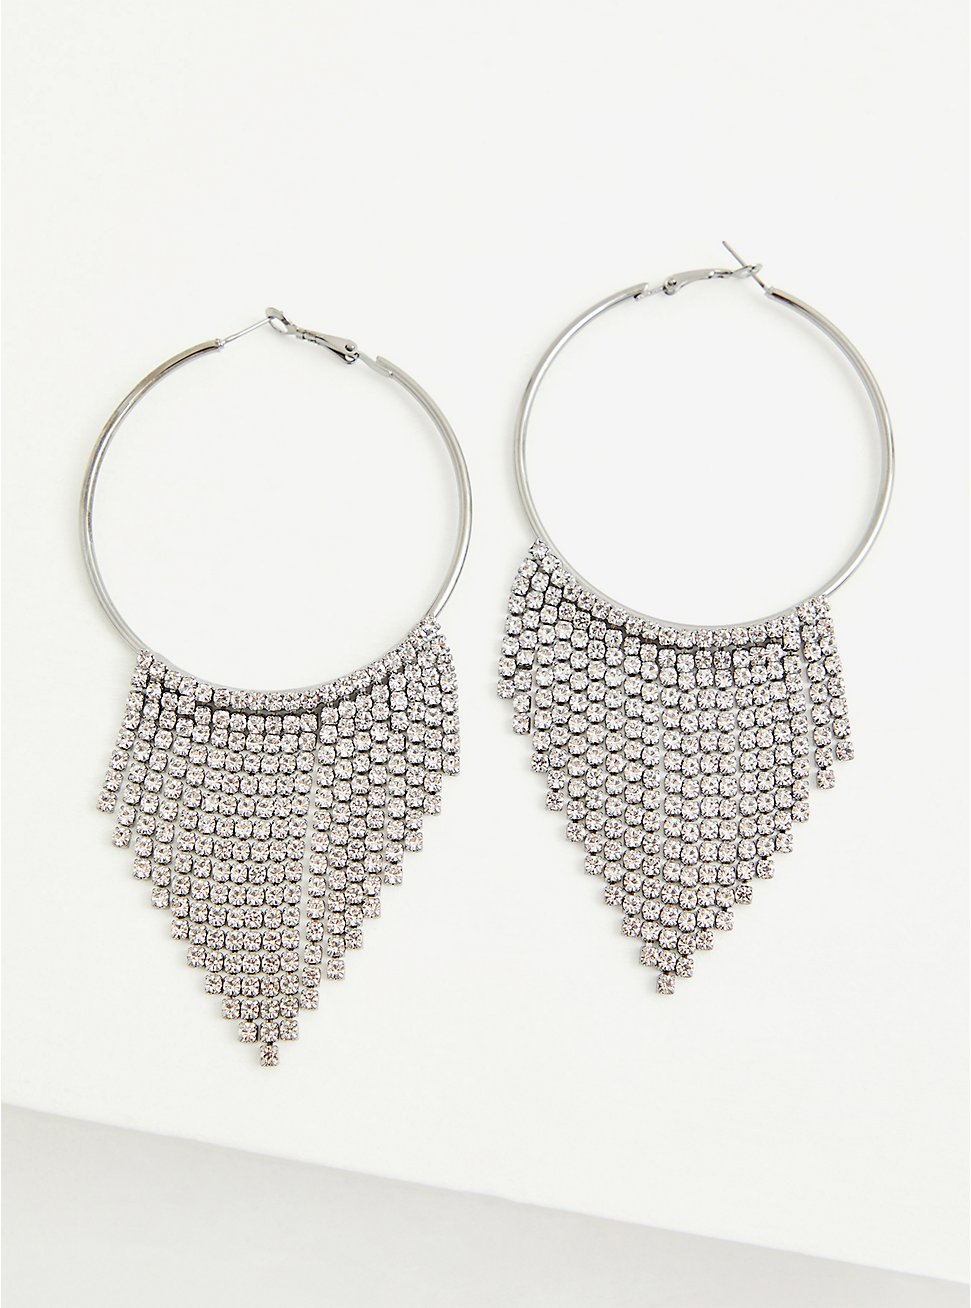 White Gold Tapered Dangle Hoop Earrings, , hi-res